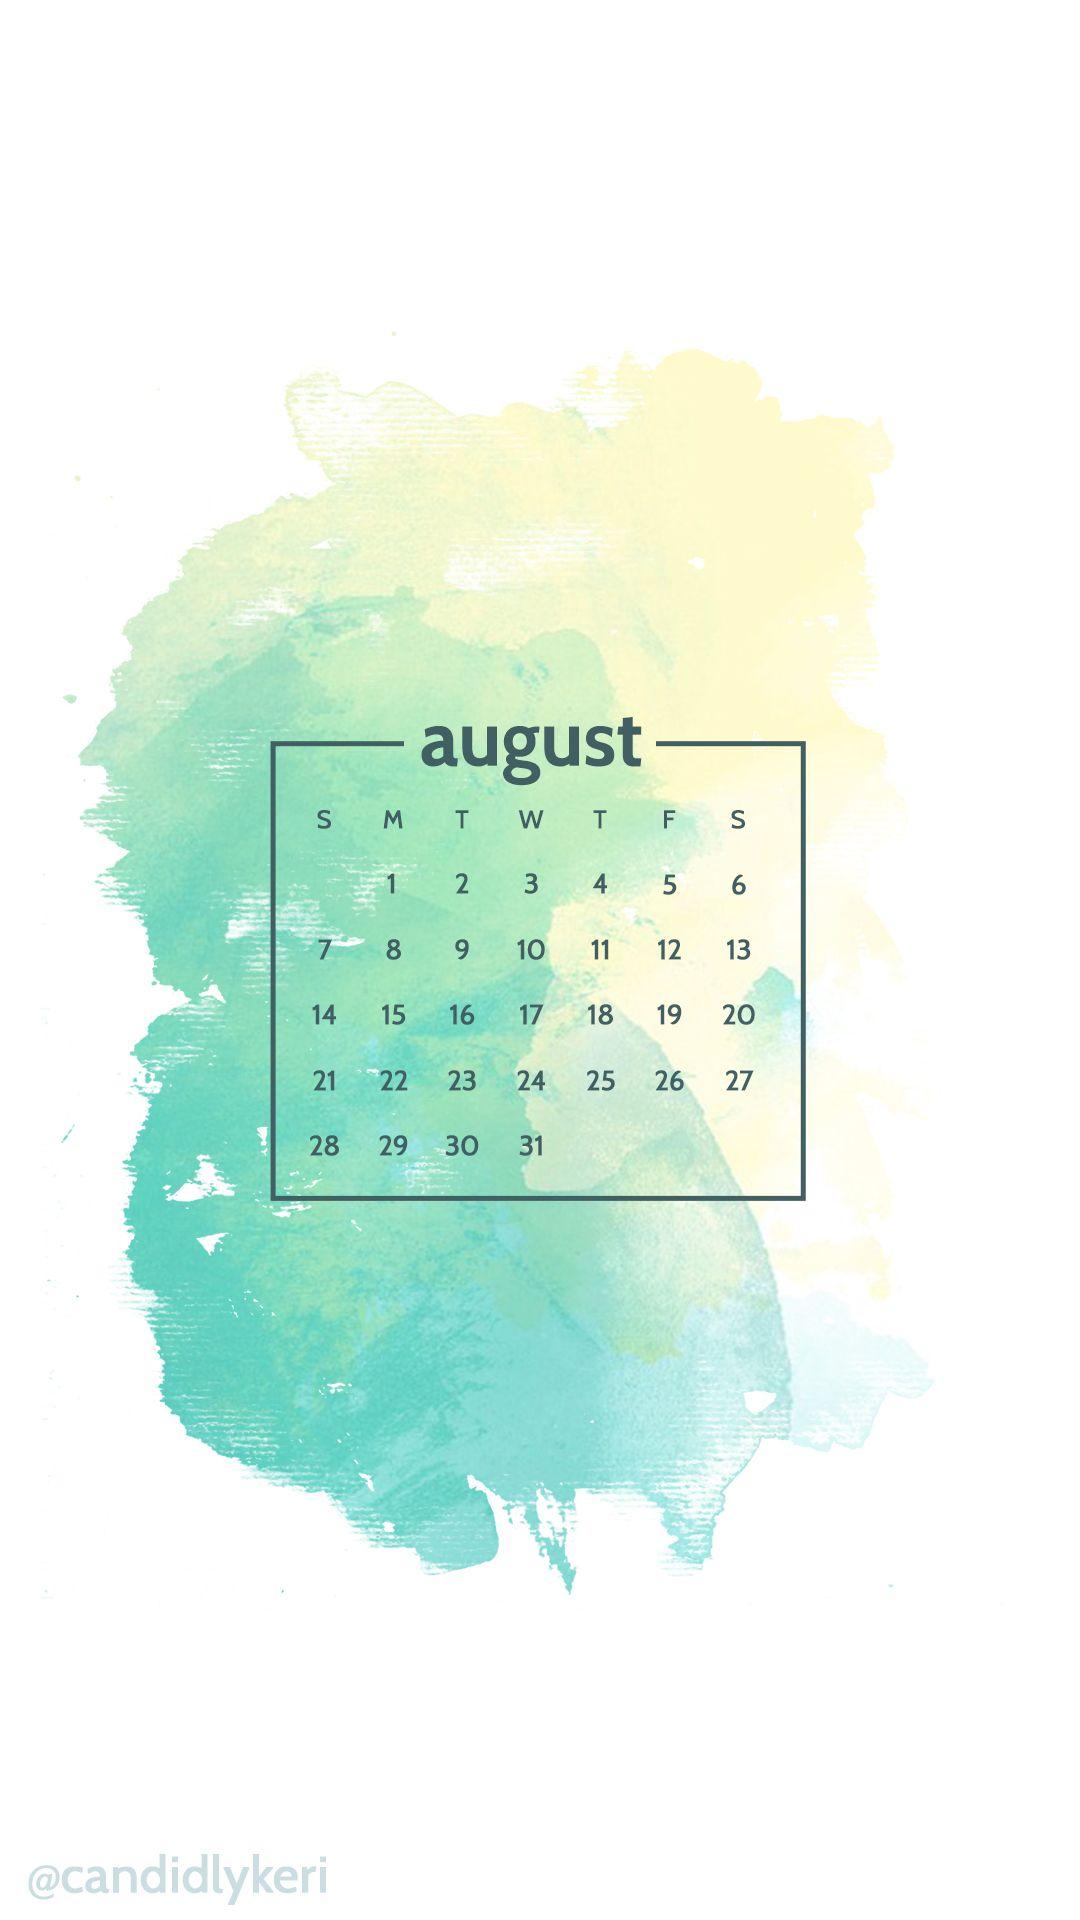 August 2017 Calendar Iphone Wallpaper – Printable Editable Blank ...